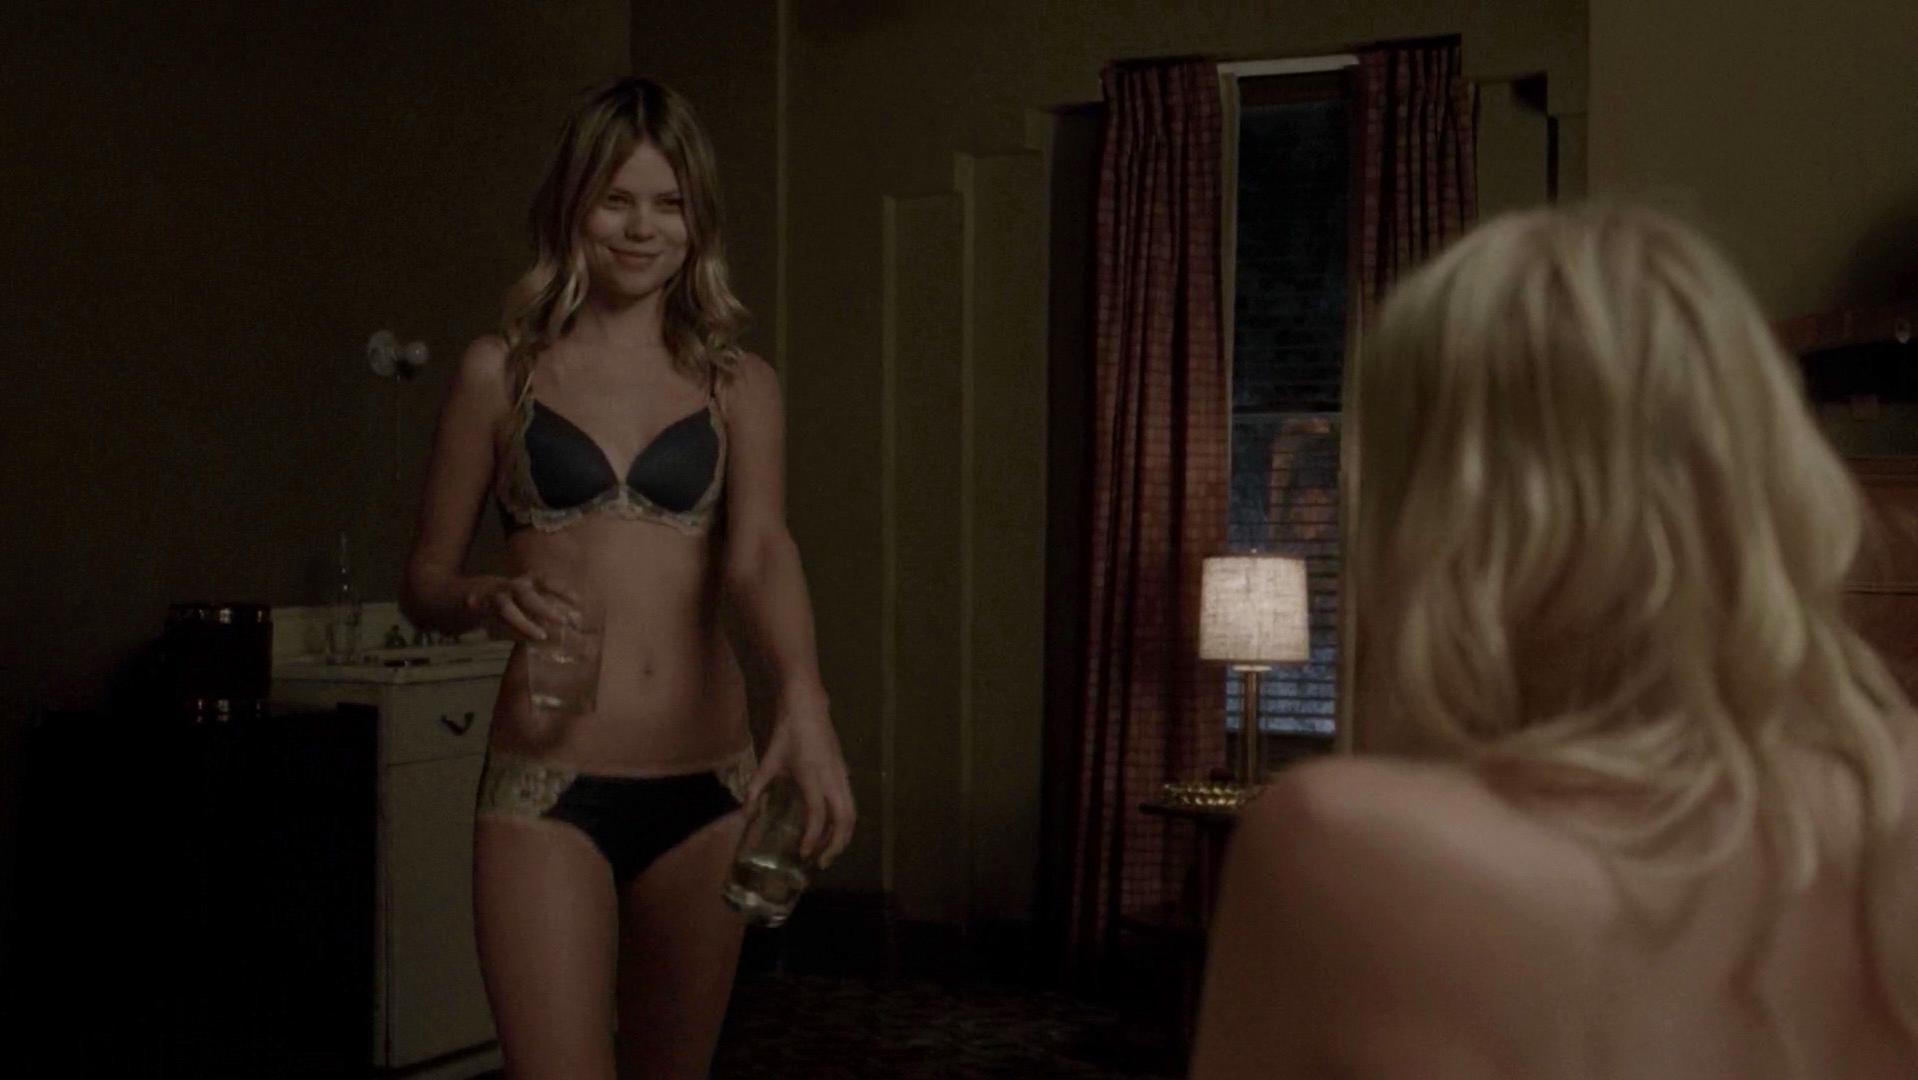 bad girls club jennavecia naked